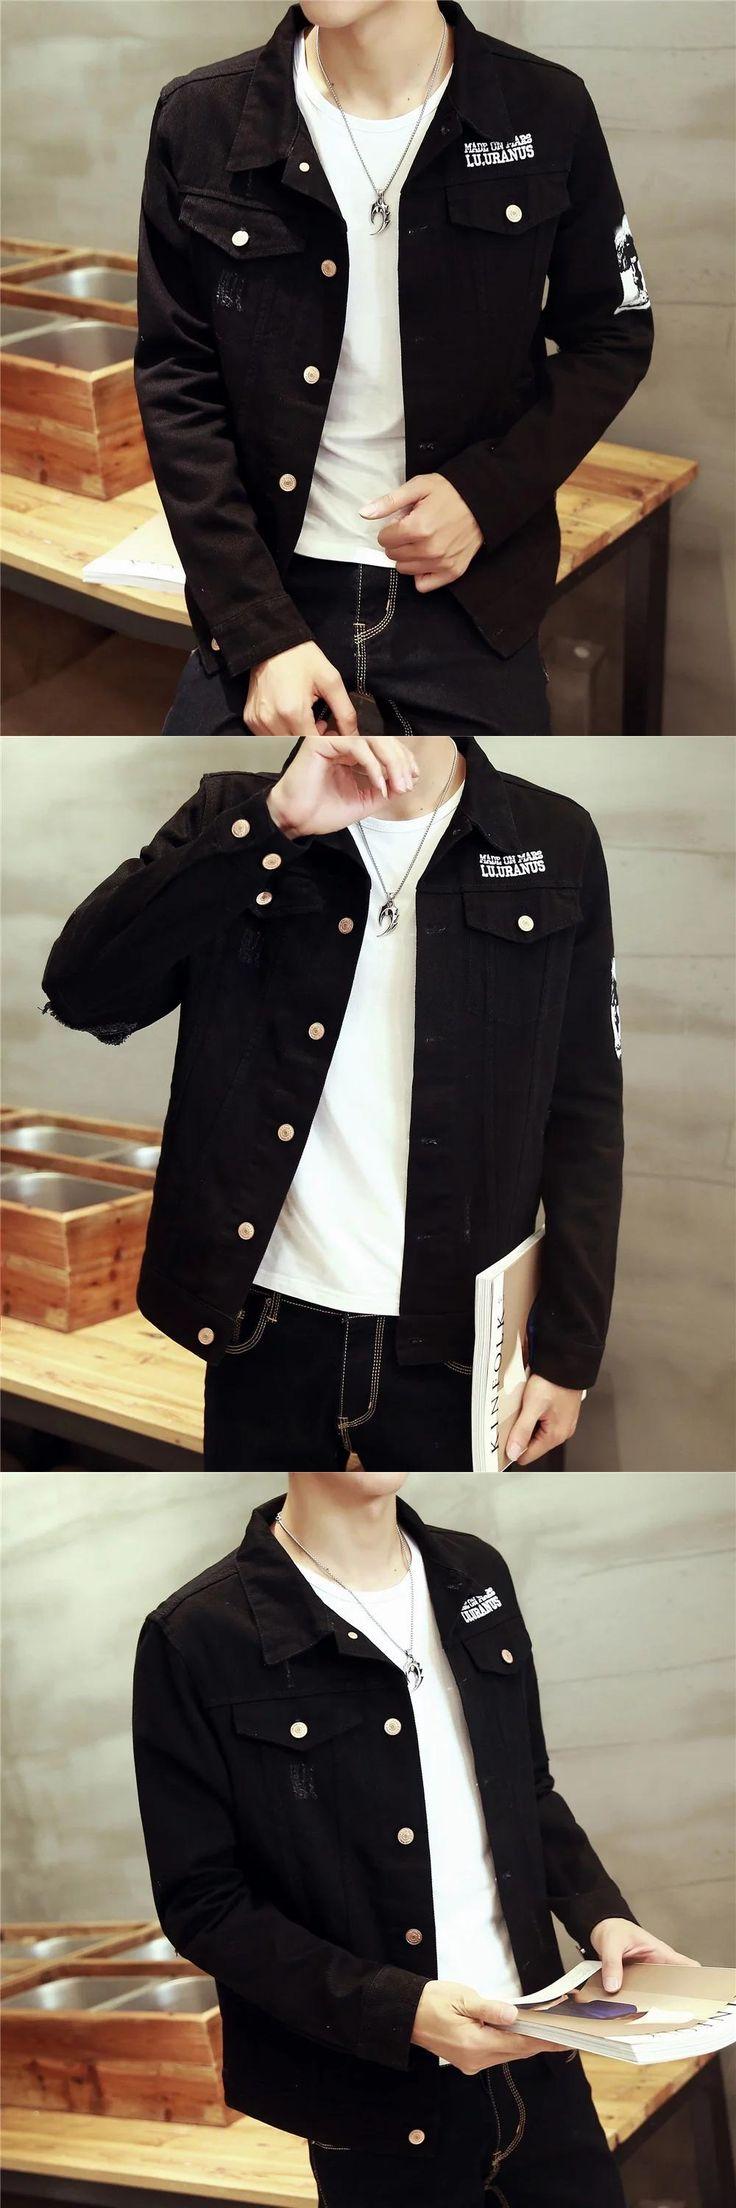 TG6318 Cheap wholesale 2017 new Han edition cultivate one's morality men's denim jacket men fall big yards coat jacket